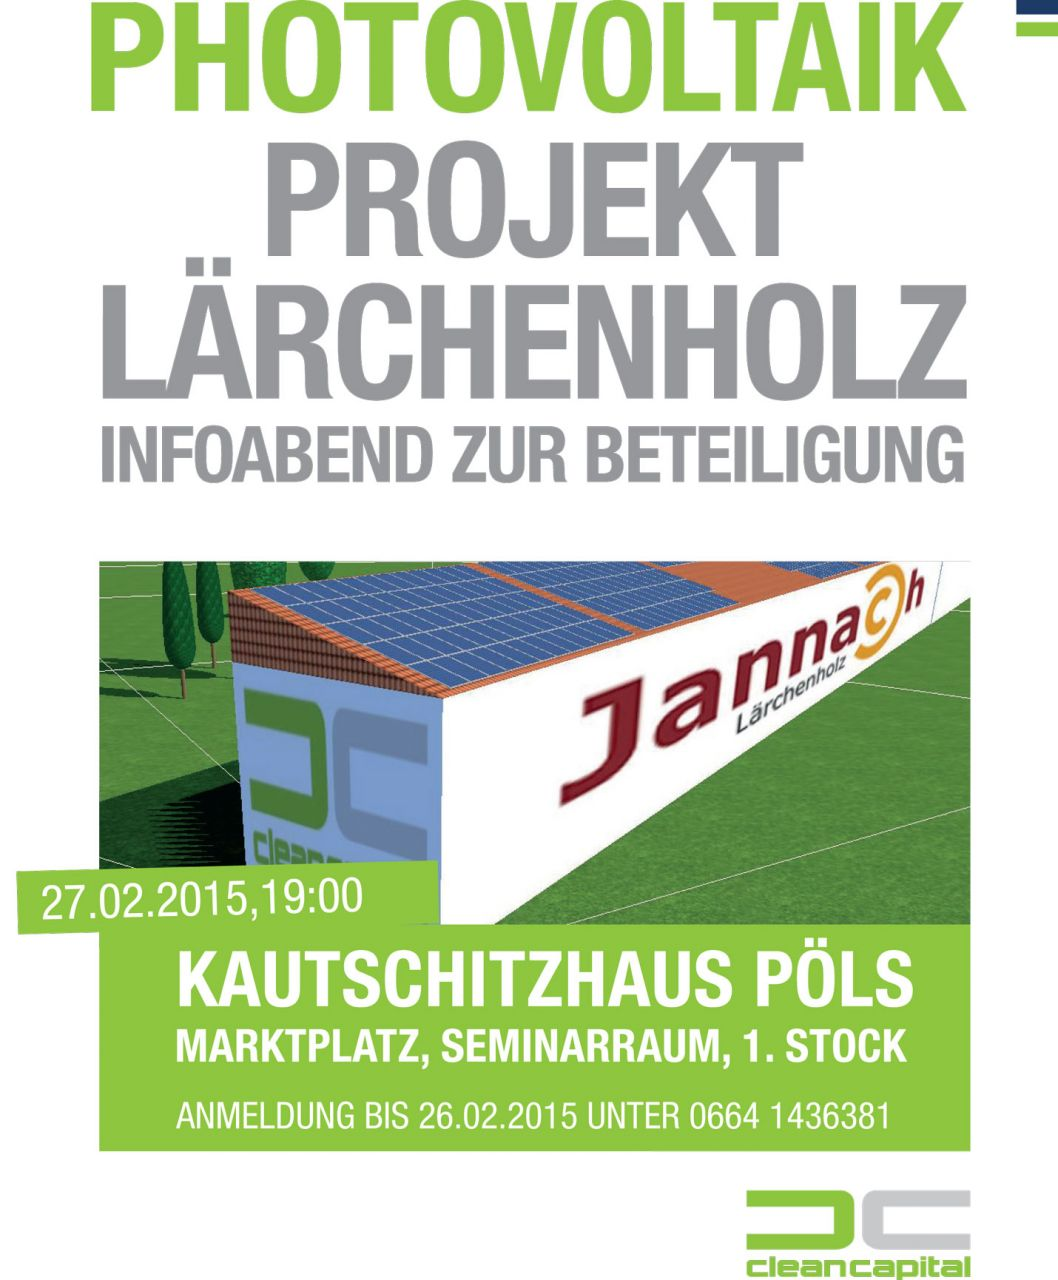 crowdfunding lärchenholz